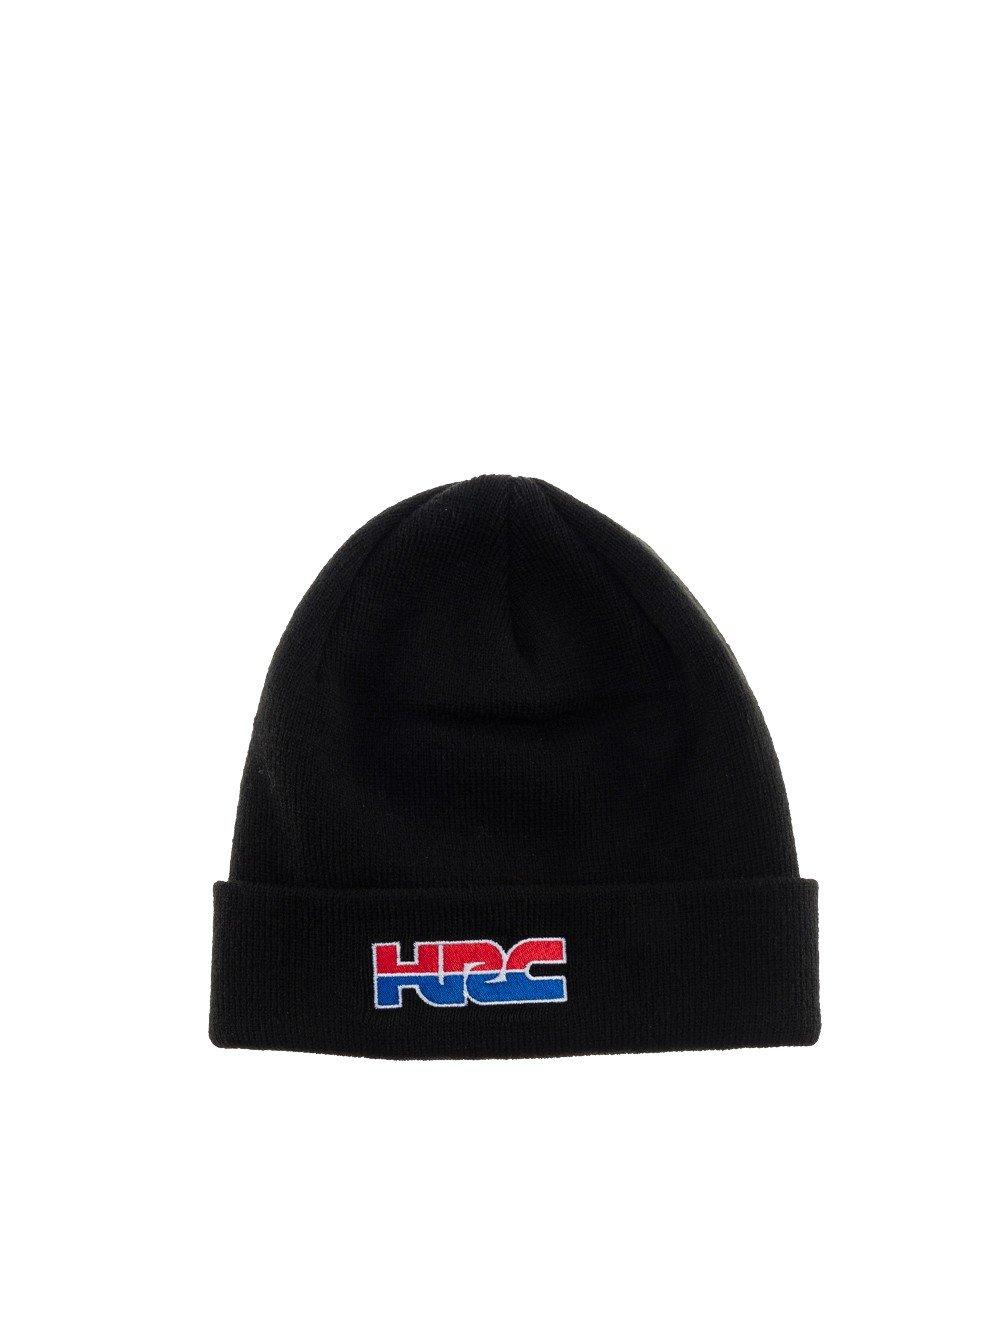 Kopfh/örer schwarz HRC